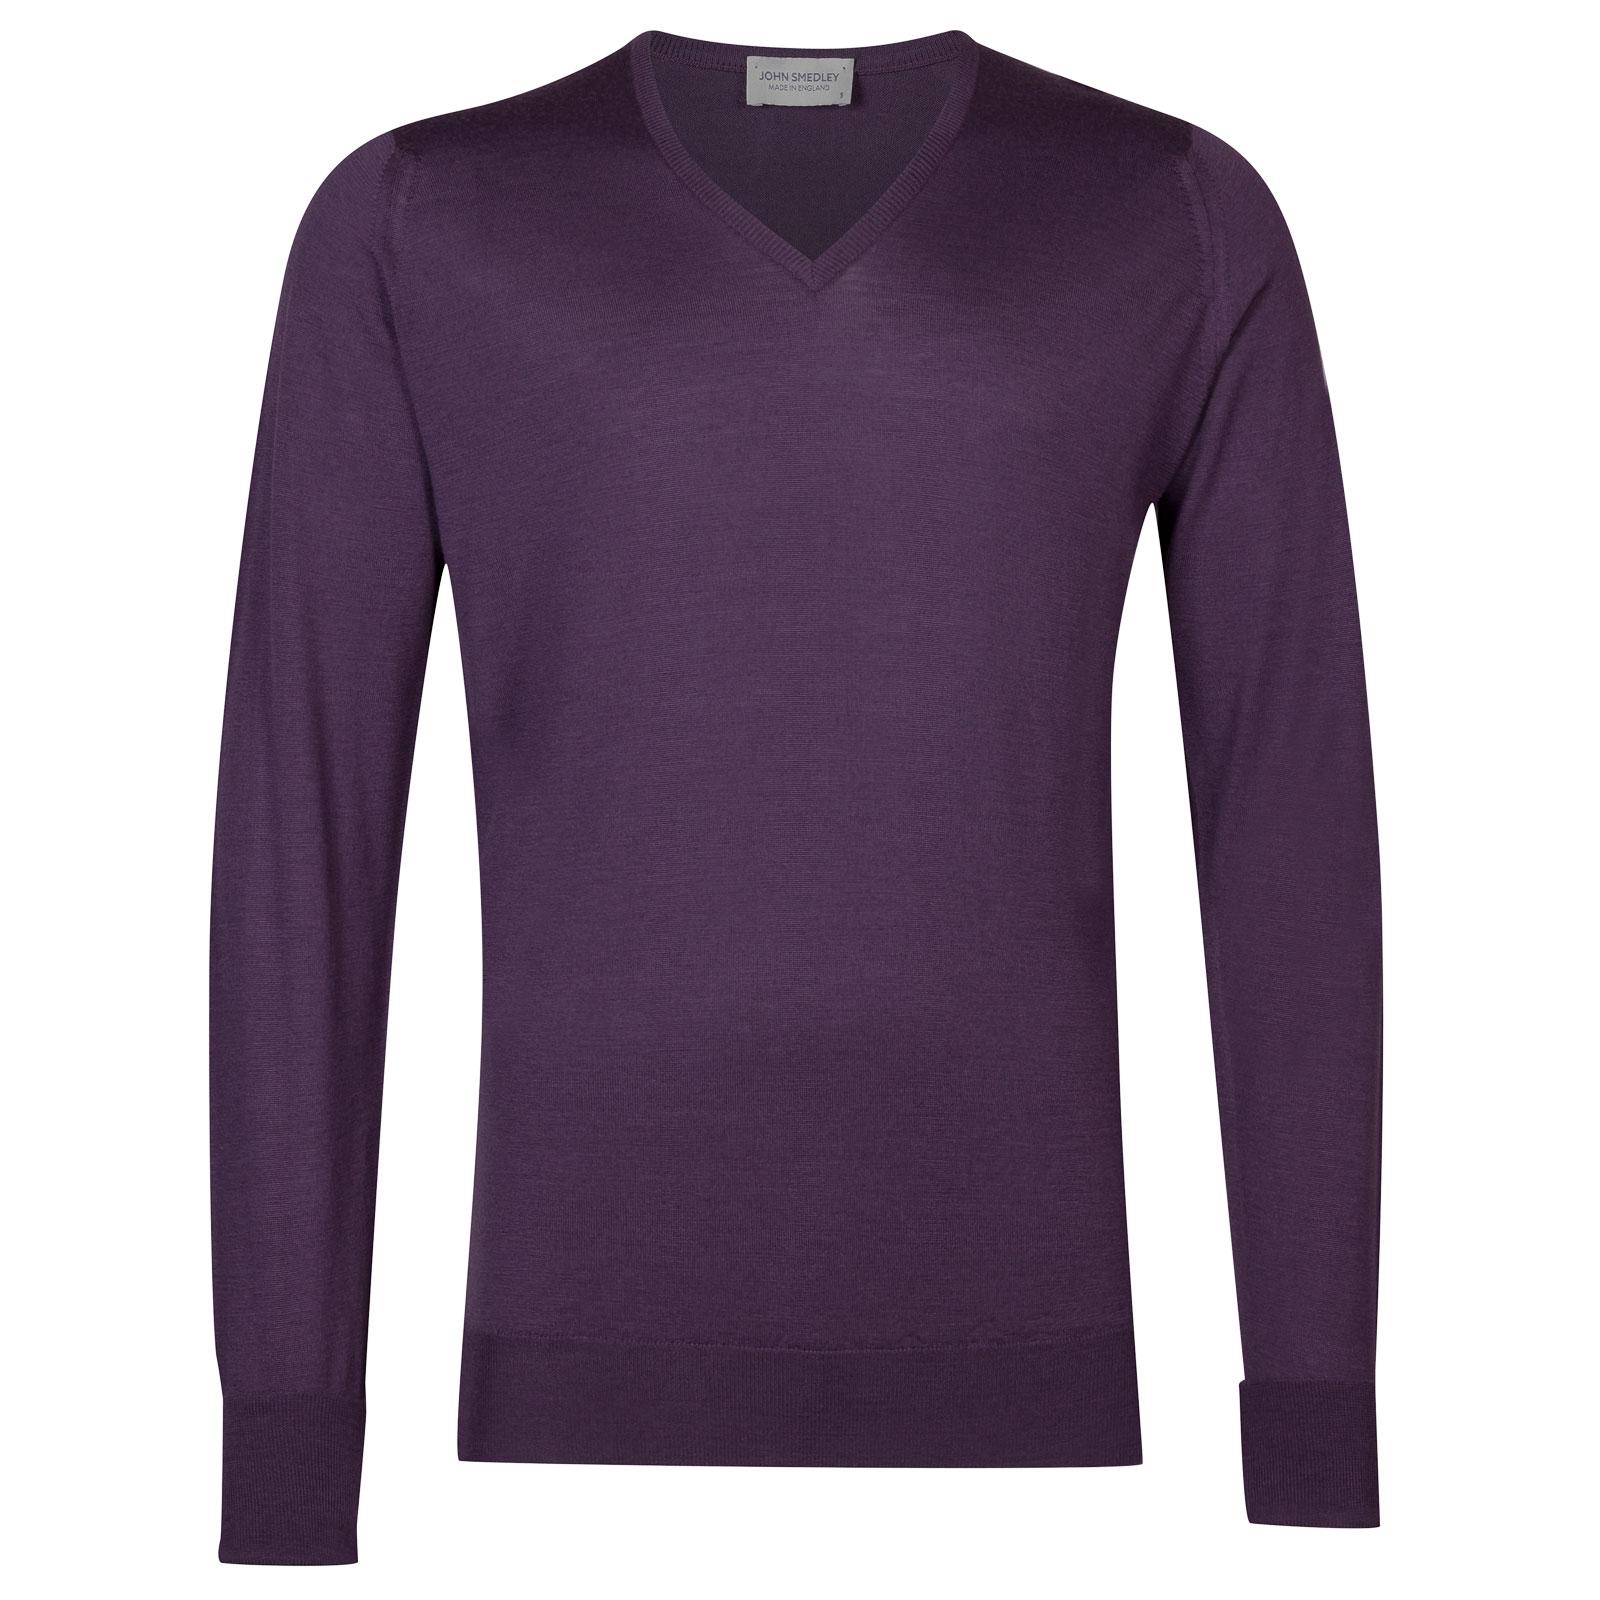 bobby-bauhaus-purple-Xxl